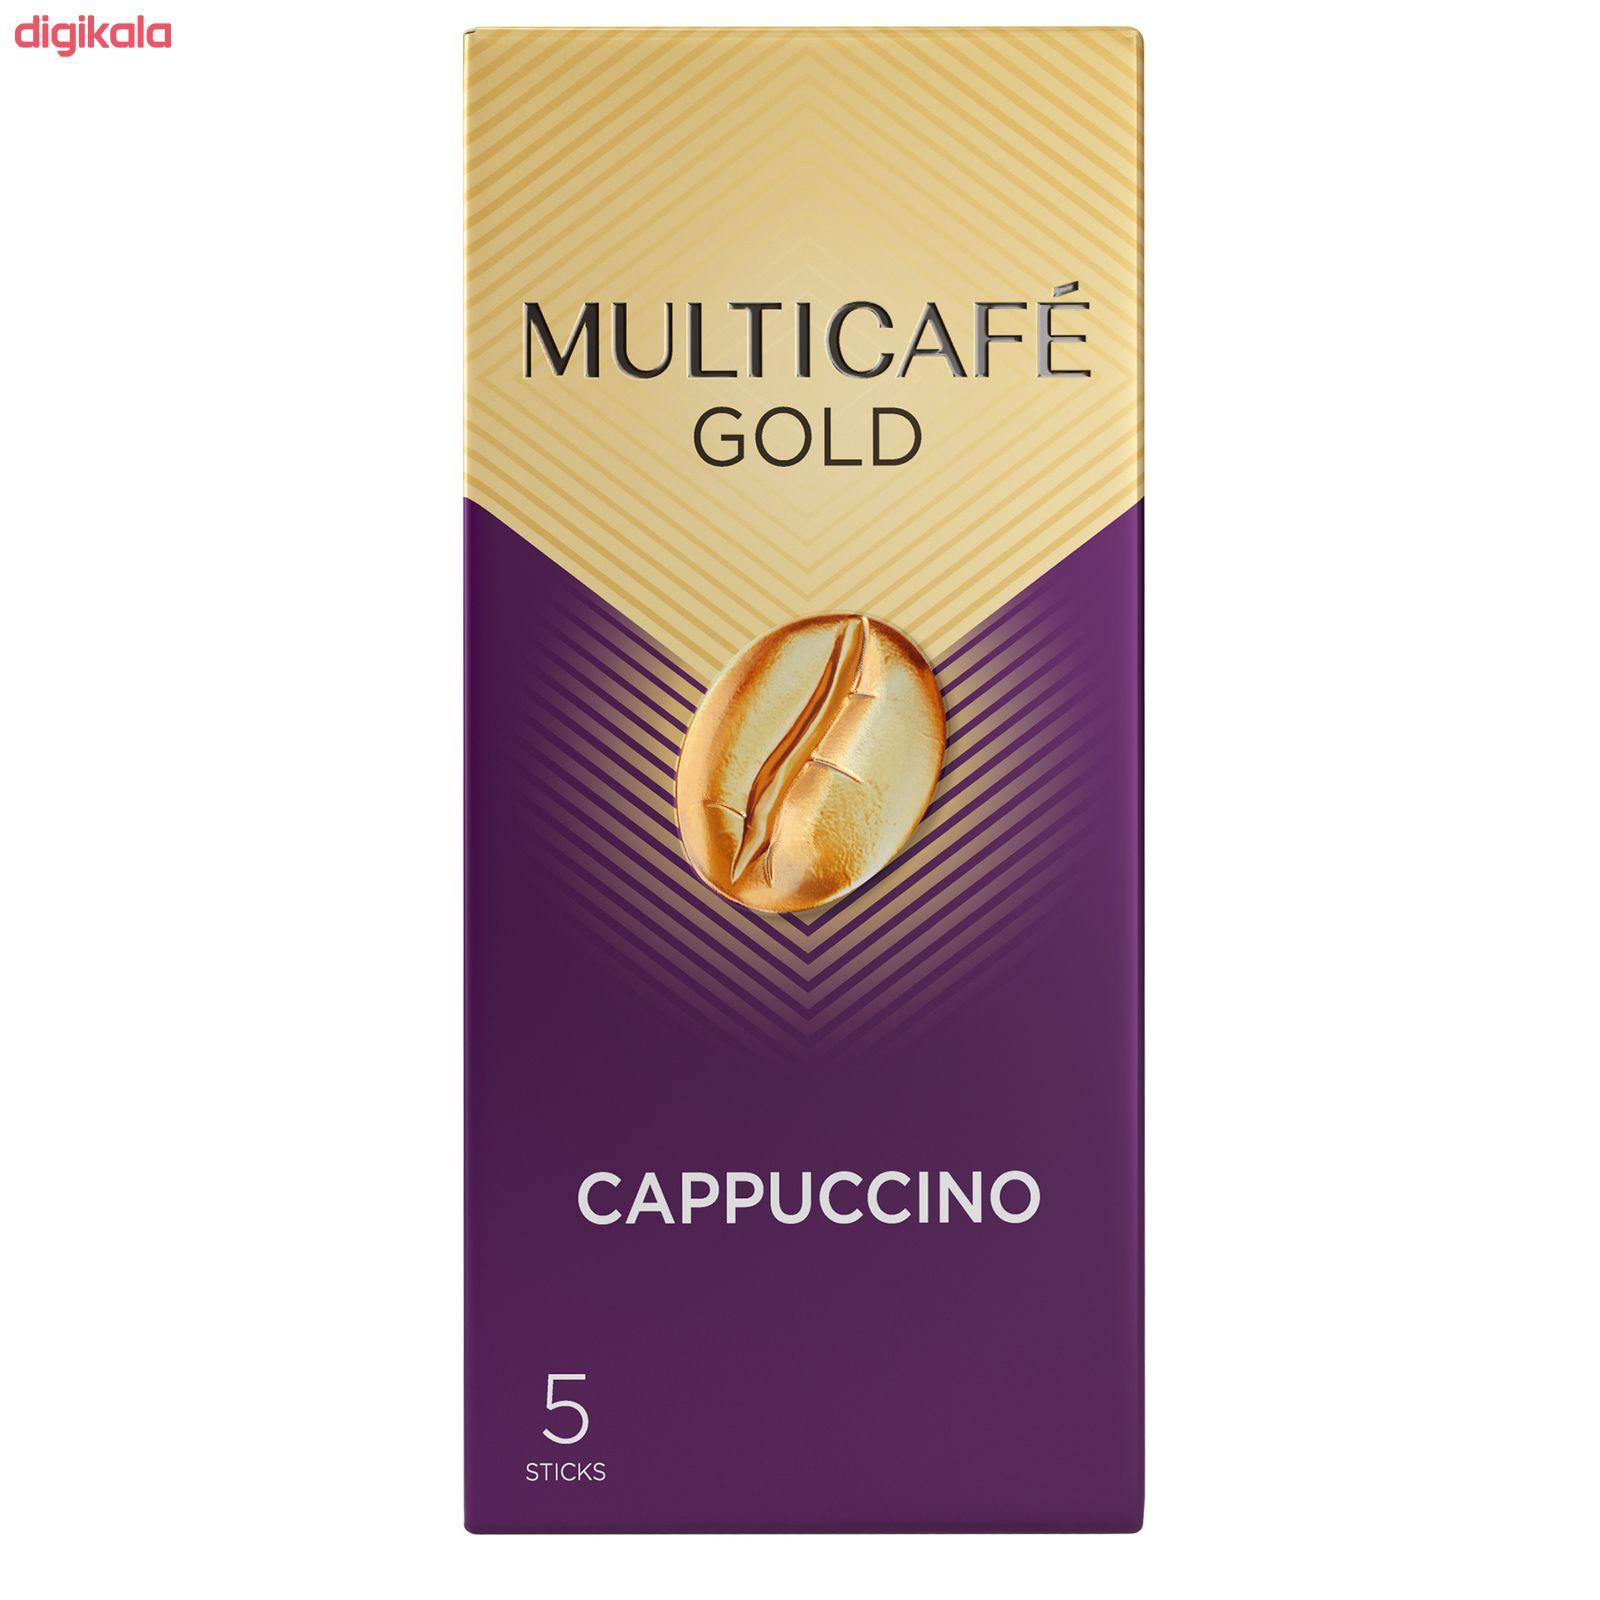 کاپوچینو گلد مولتی کافه بسته 5 عددی  main 1 4